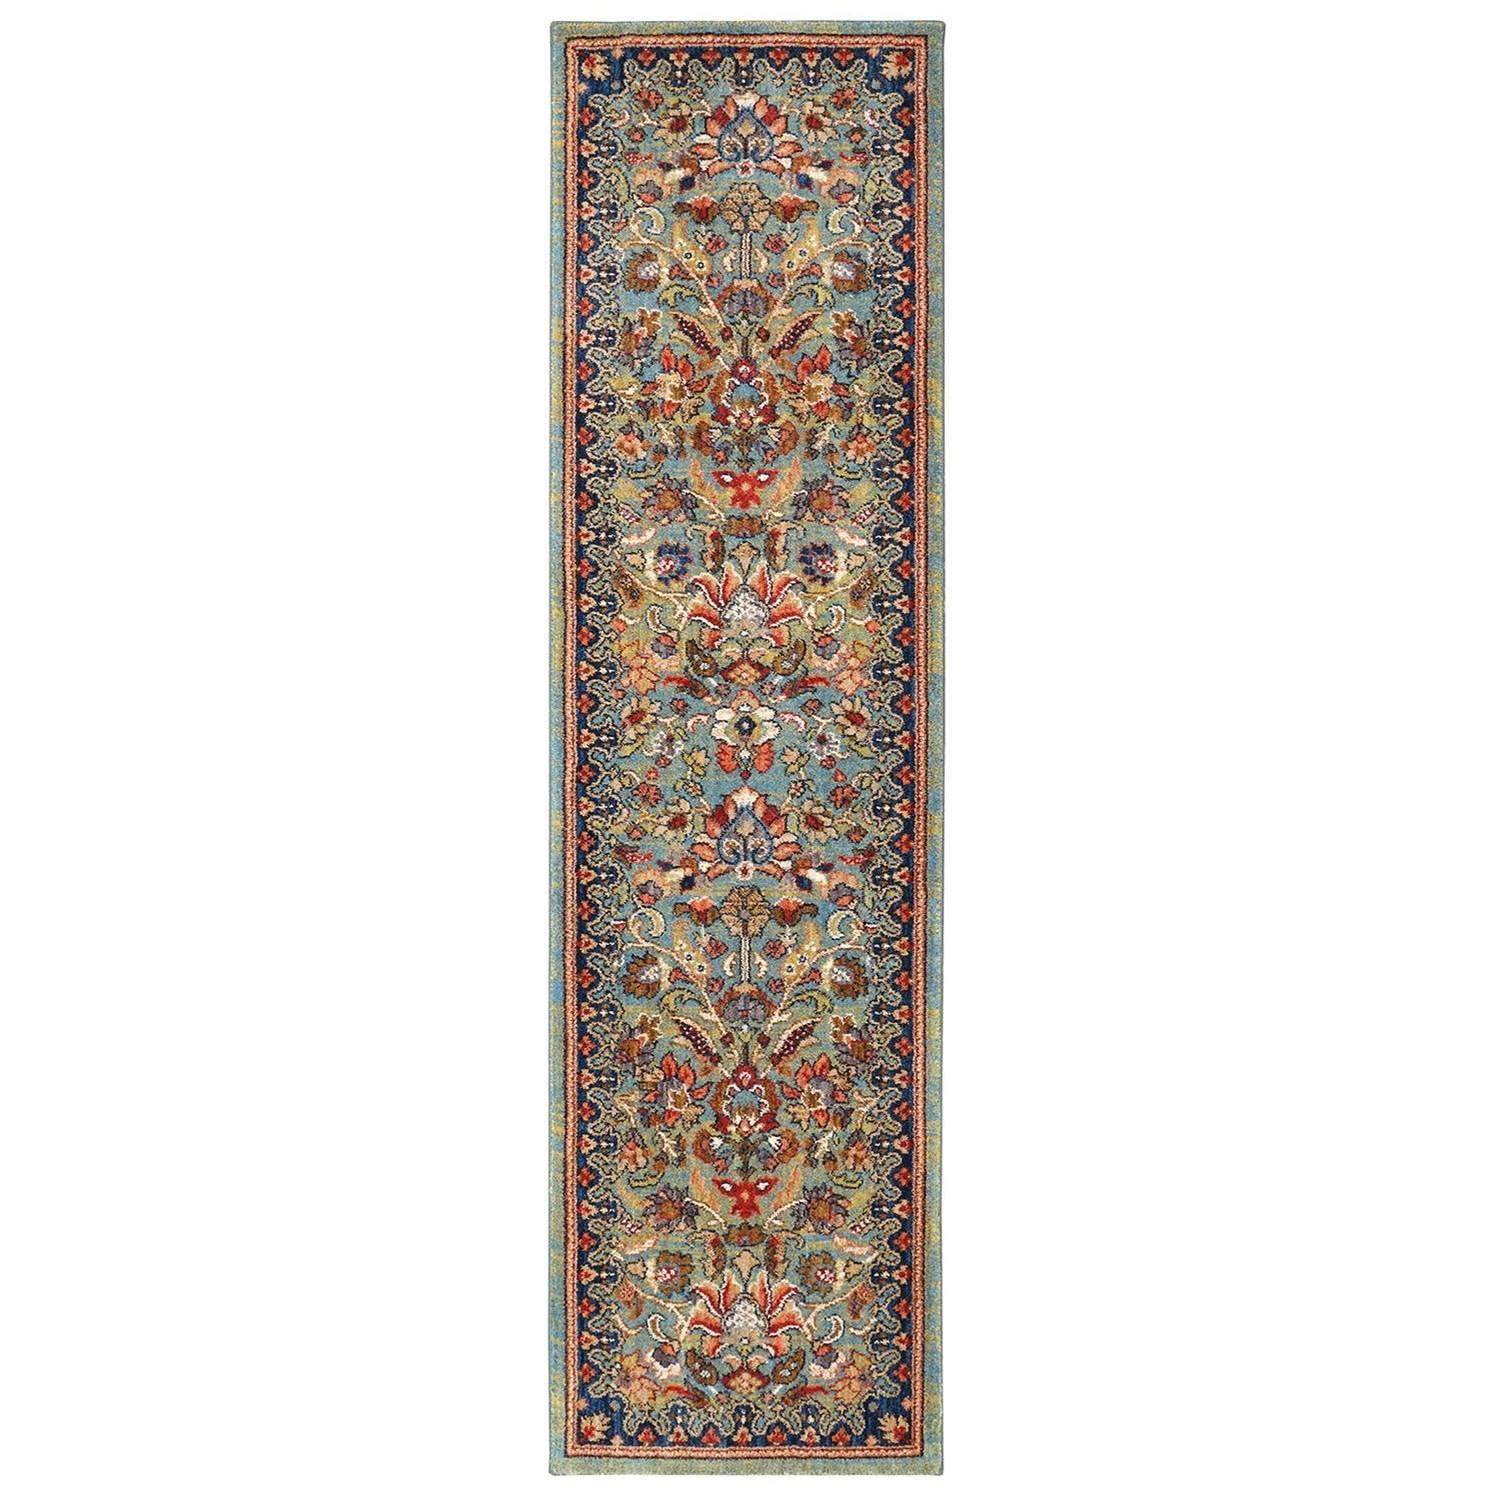 "Spice Market 2' 4""x80' Ornamental Roll Runner by Karastan Rugs at Darvin Furniture"